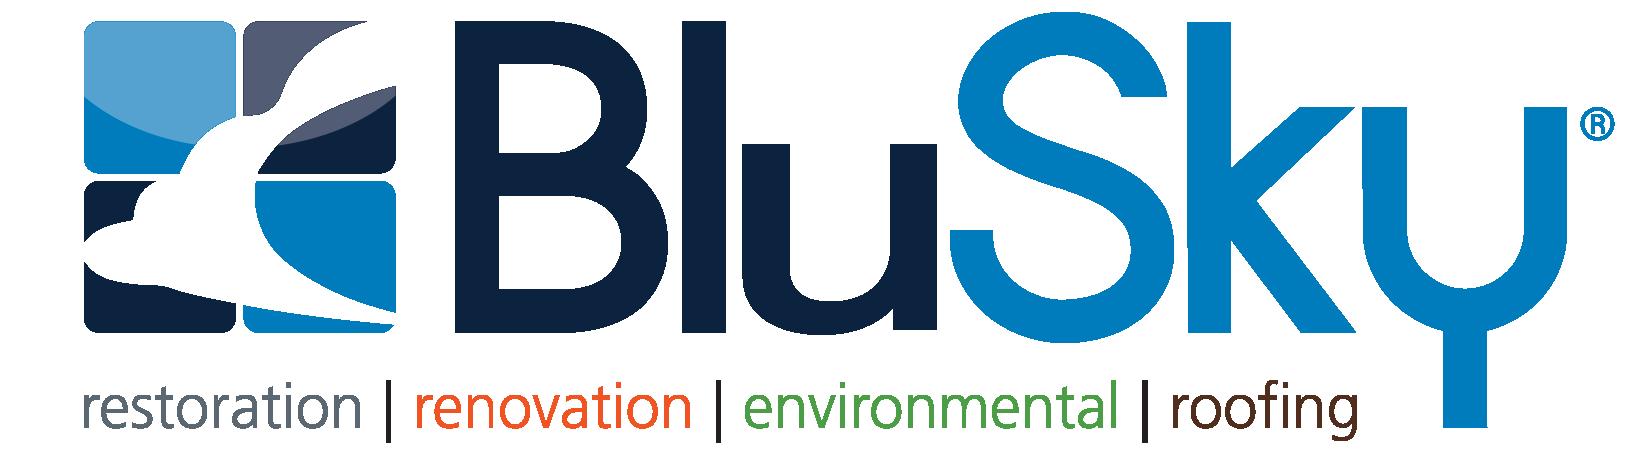 BluSky_logo_tags